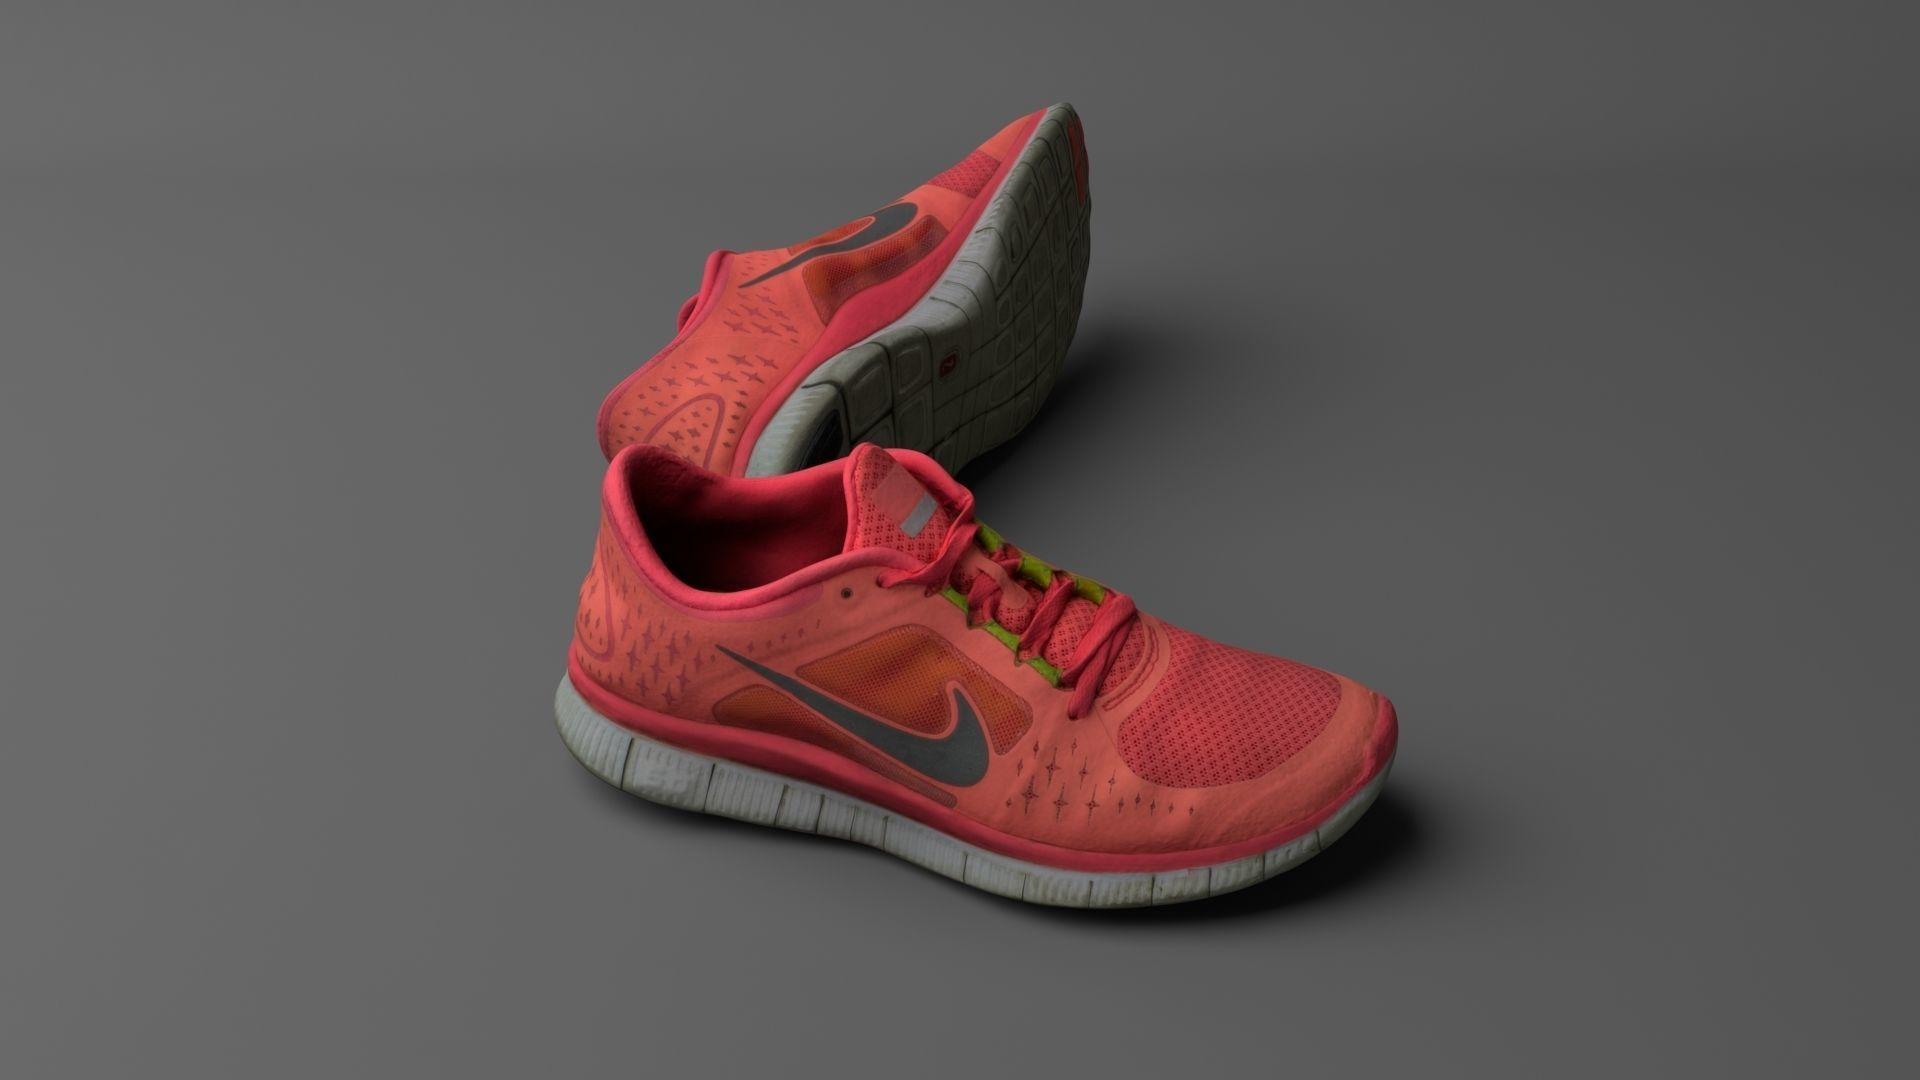 cf1b805ce956 worn nike free run 3 sneaker shoe low poly 3d model 3d model obj mtl fbx ...